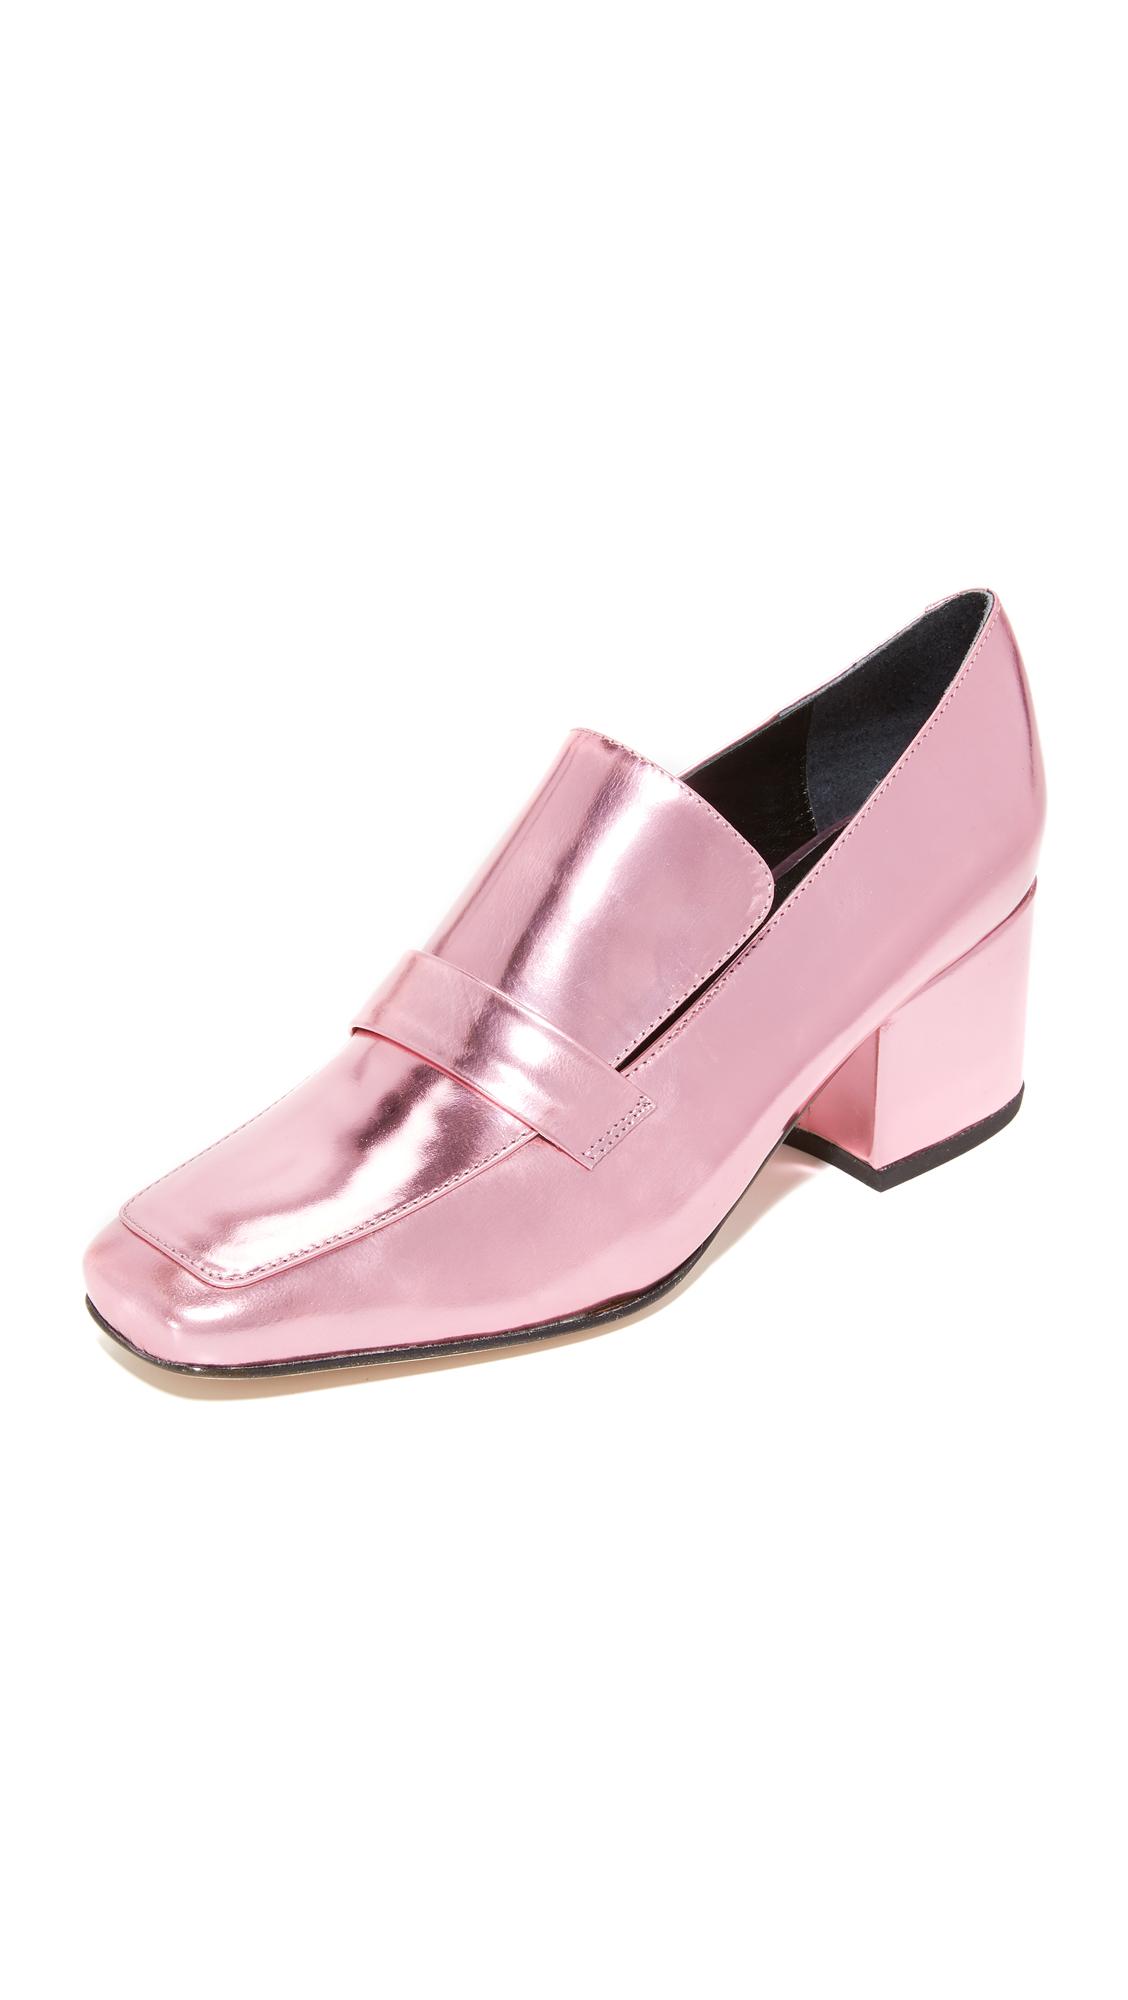 Dorateymur Turbojet Loafers - Pink Metallic at Shopbop